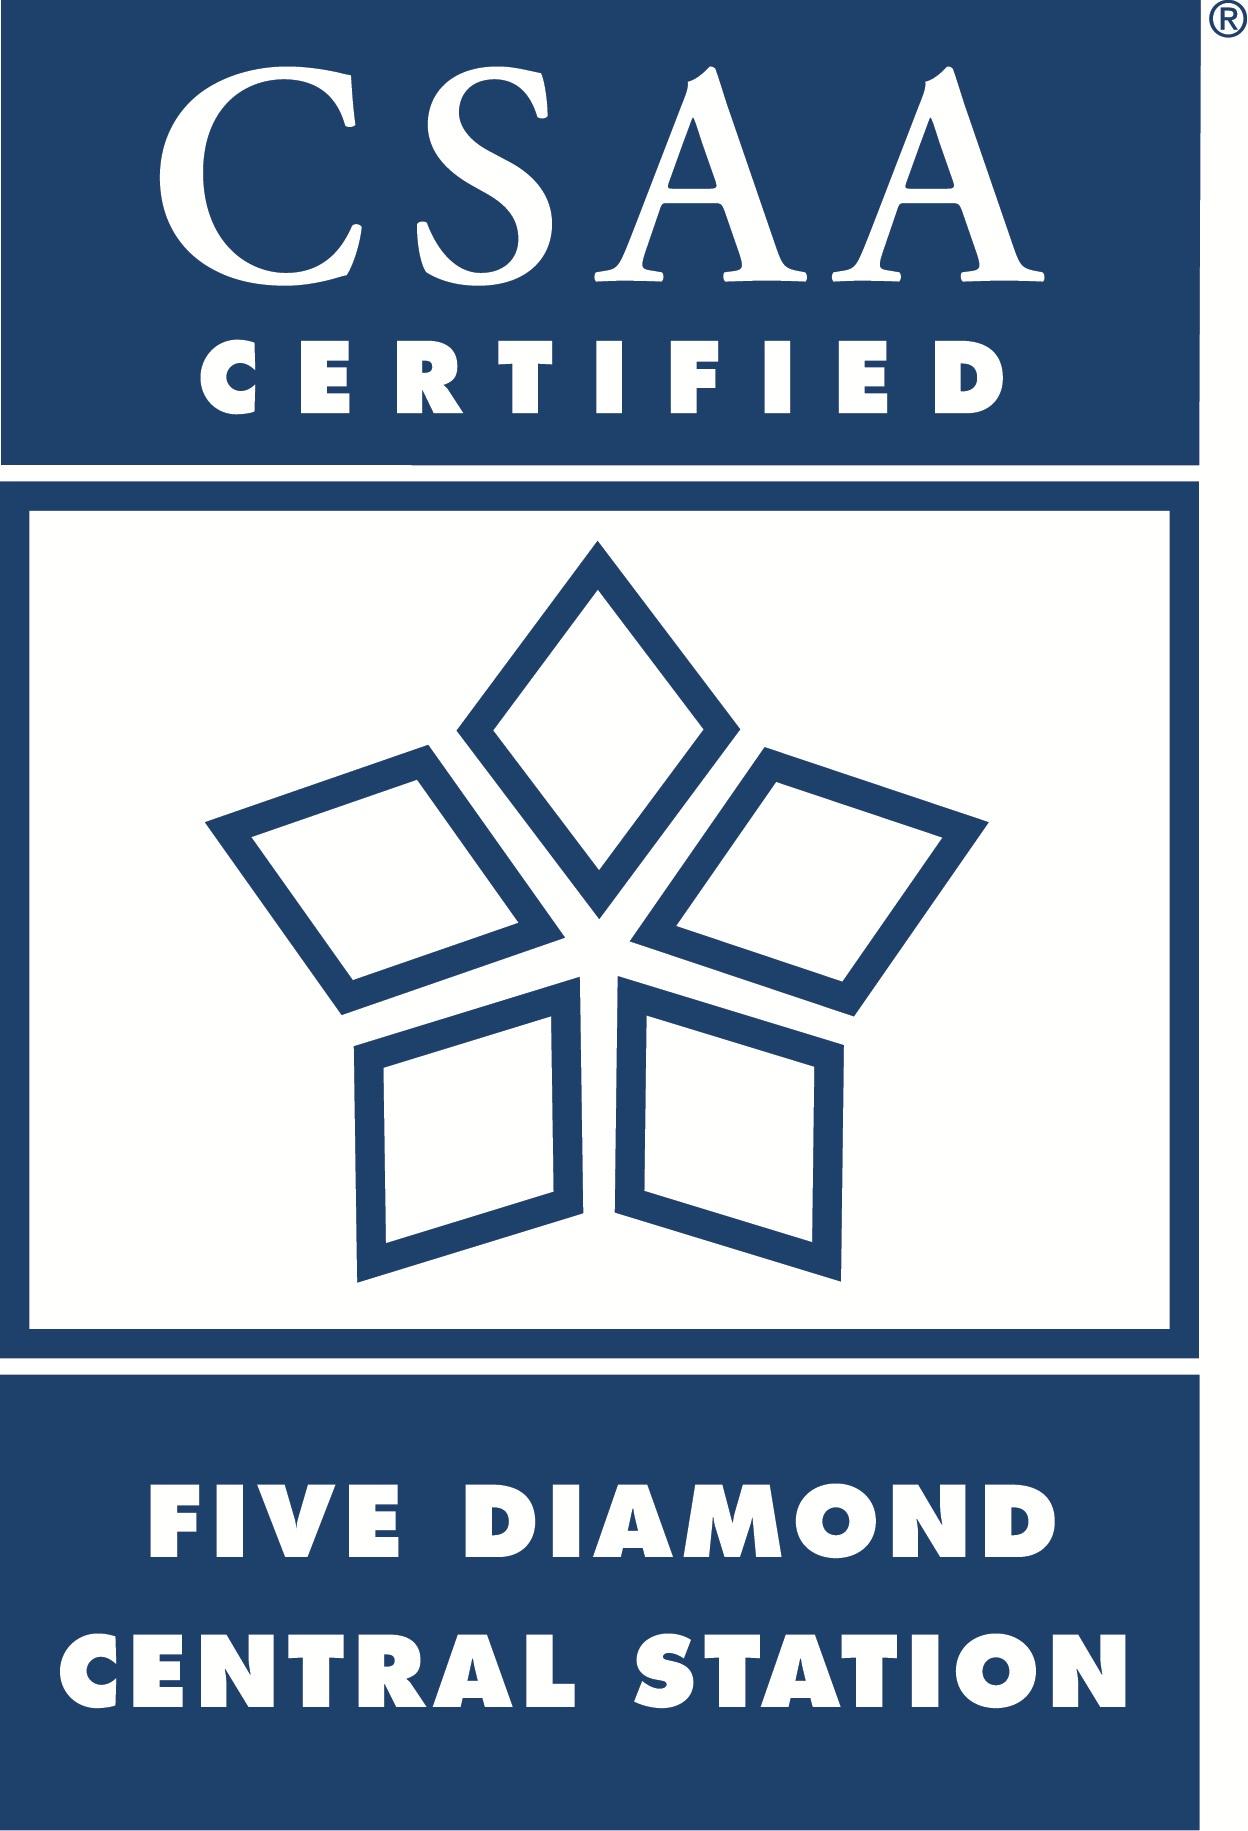 Highest Certifications & Standards